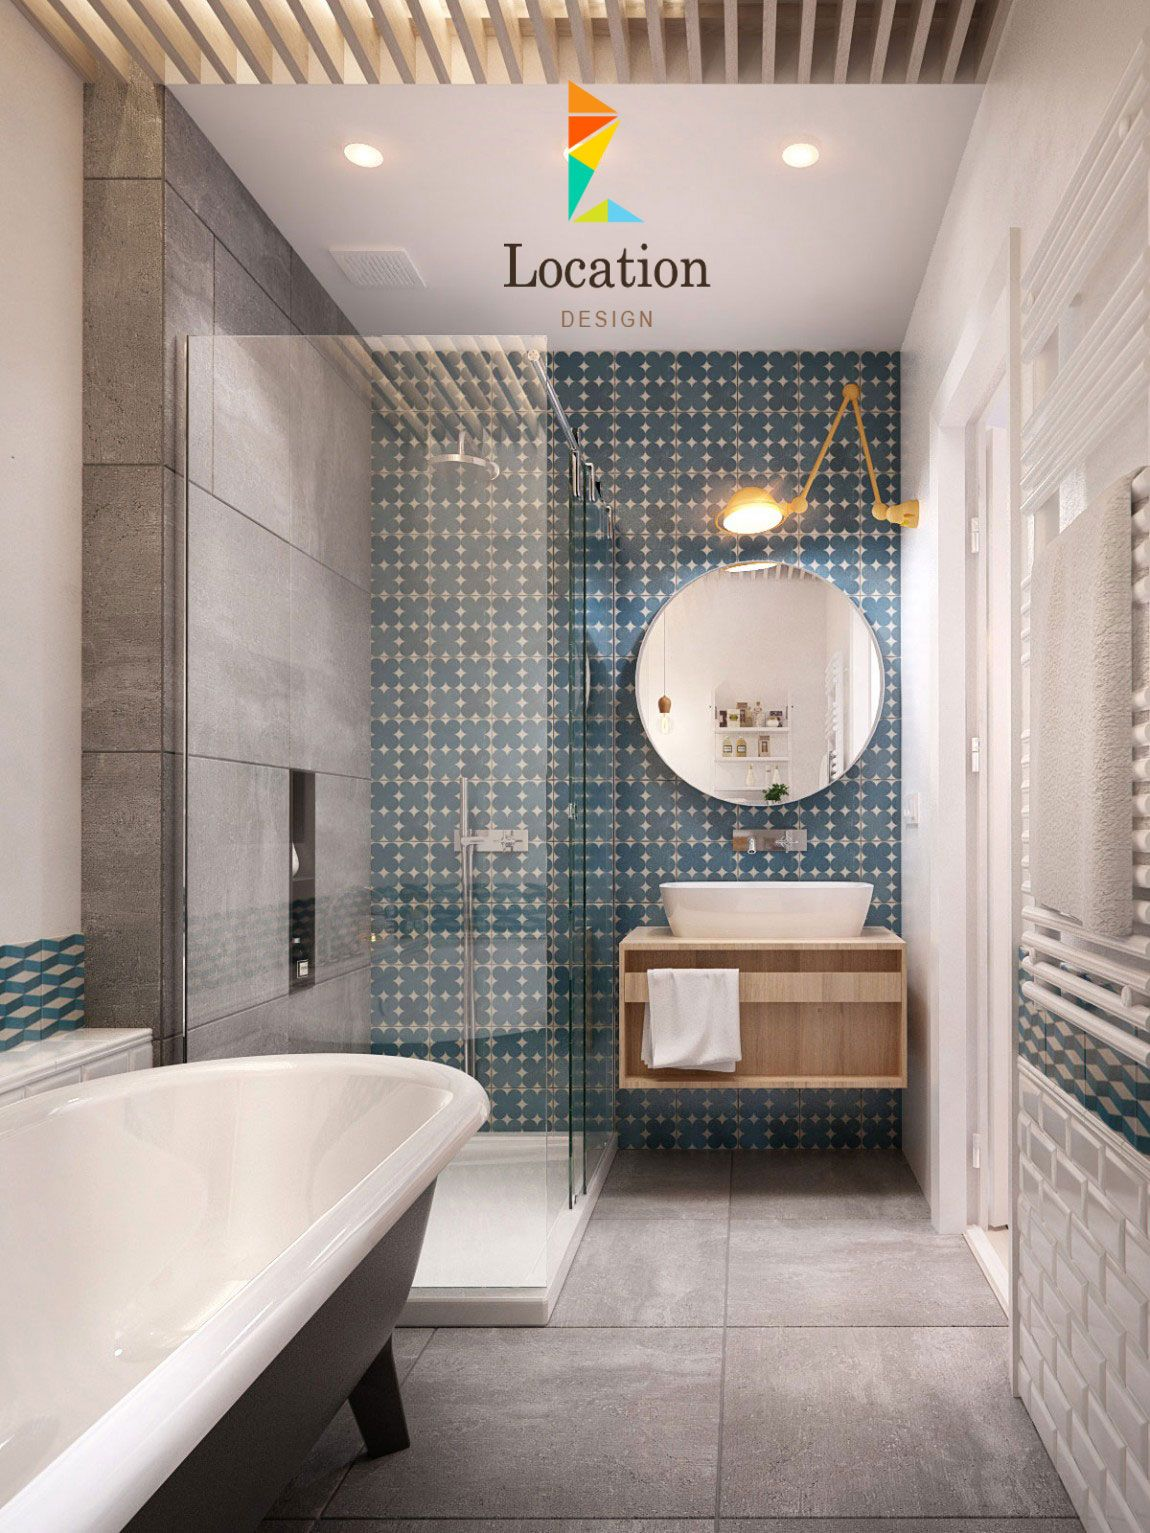 أحدث ديكورات حمامات مودرن 2018 2019 لوكشين ديزين نت Bathroom Interior Bathroom Inspiration Bathroom Design